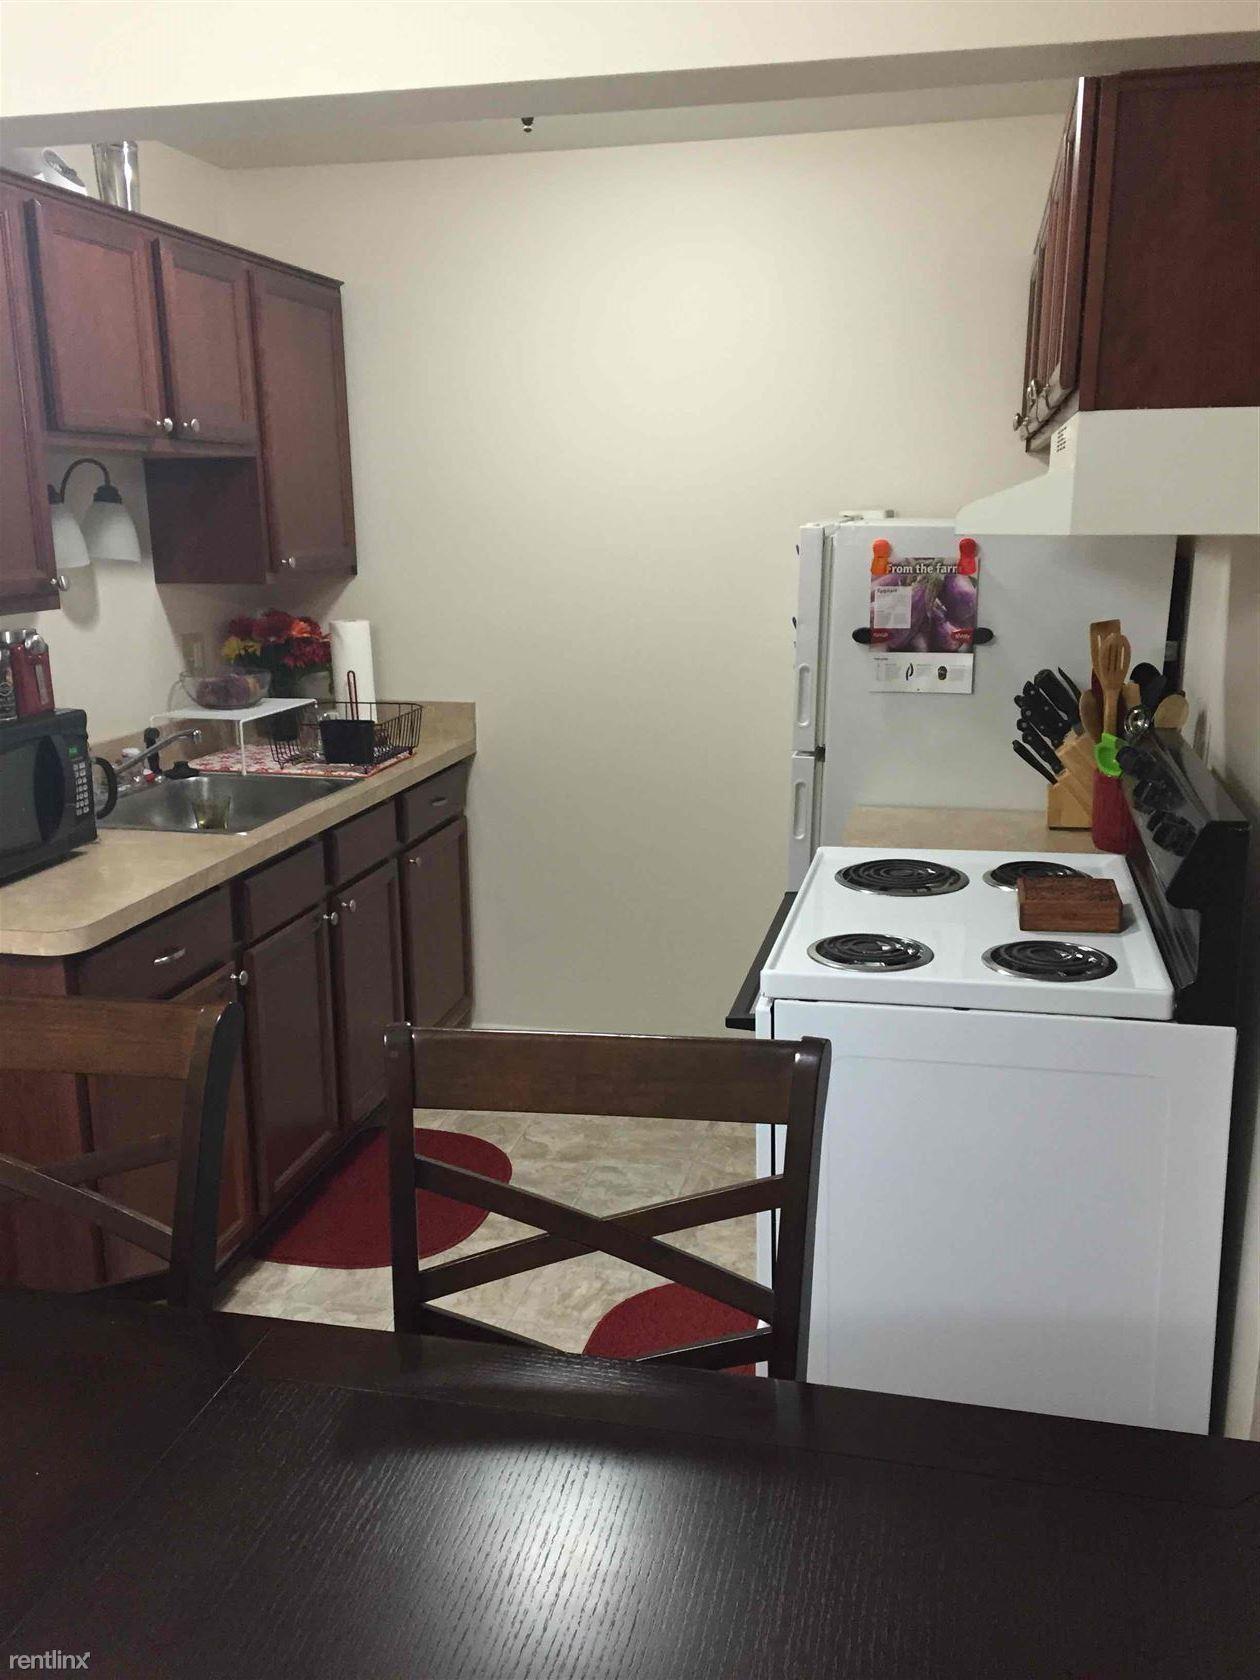 Upgraded 697 sq ft 1 br, remodeled kitchen